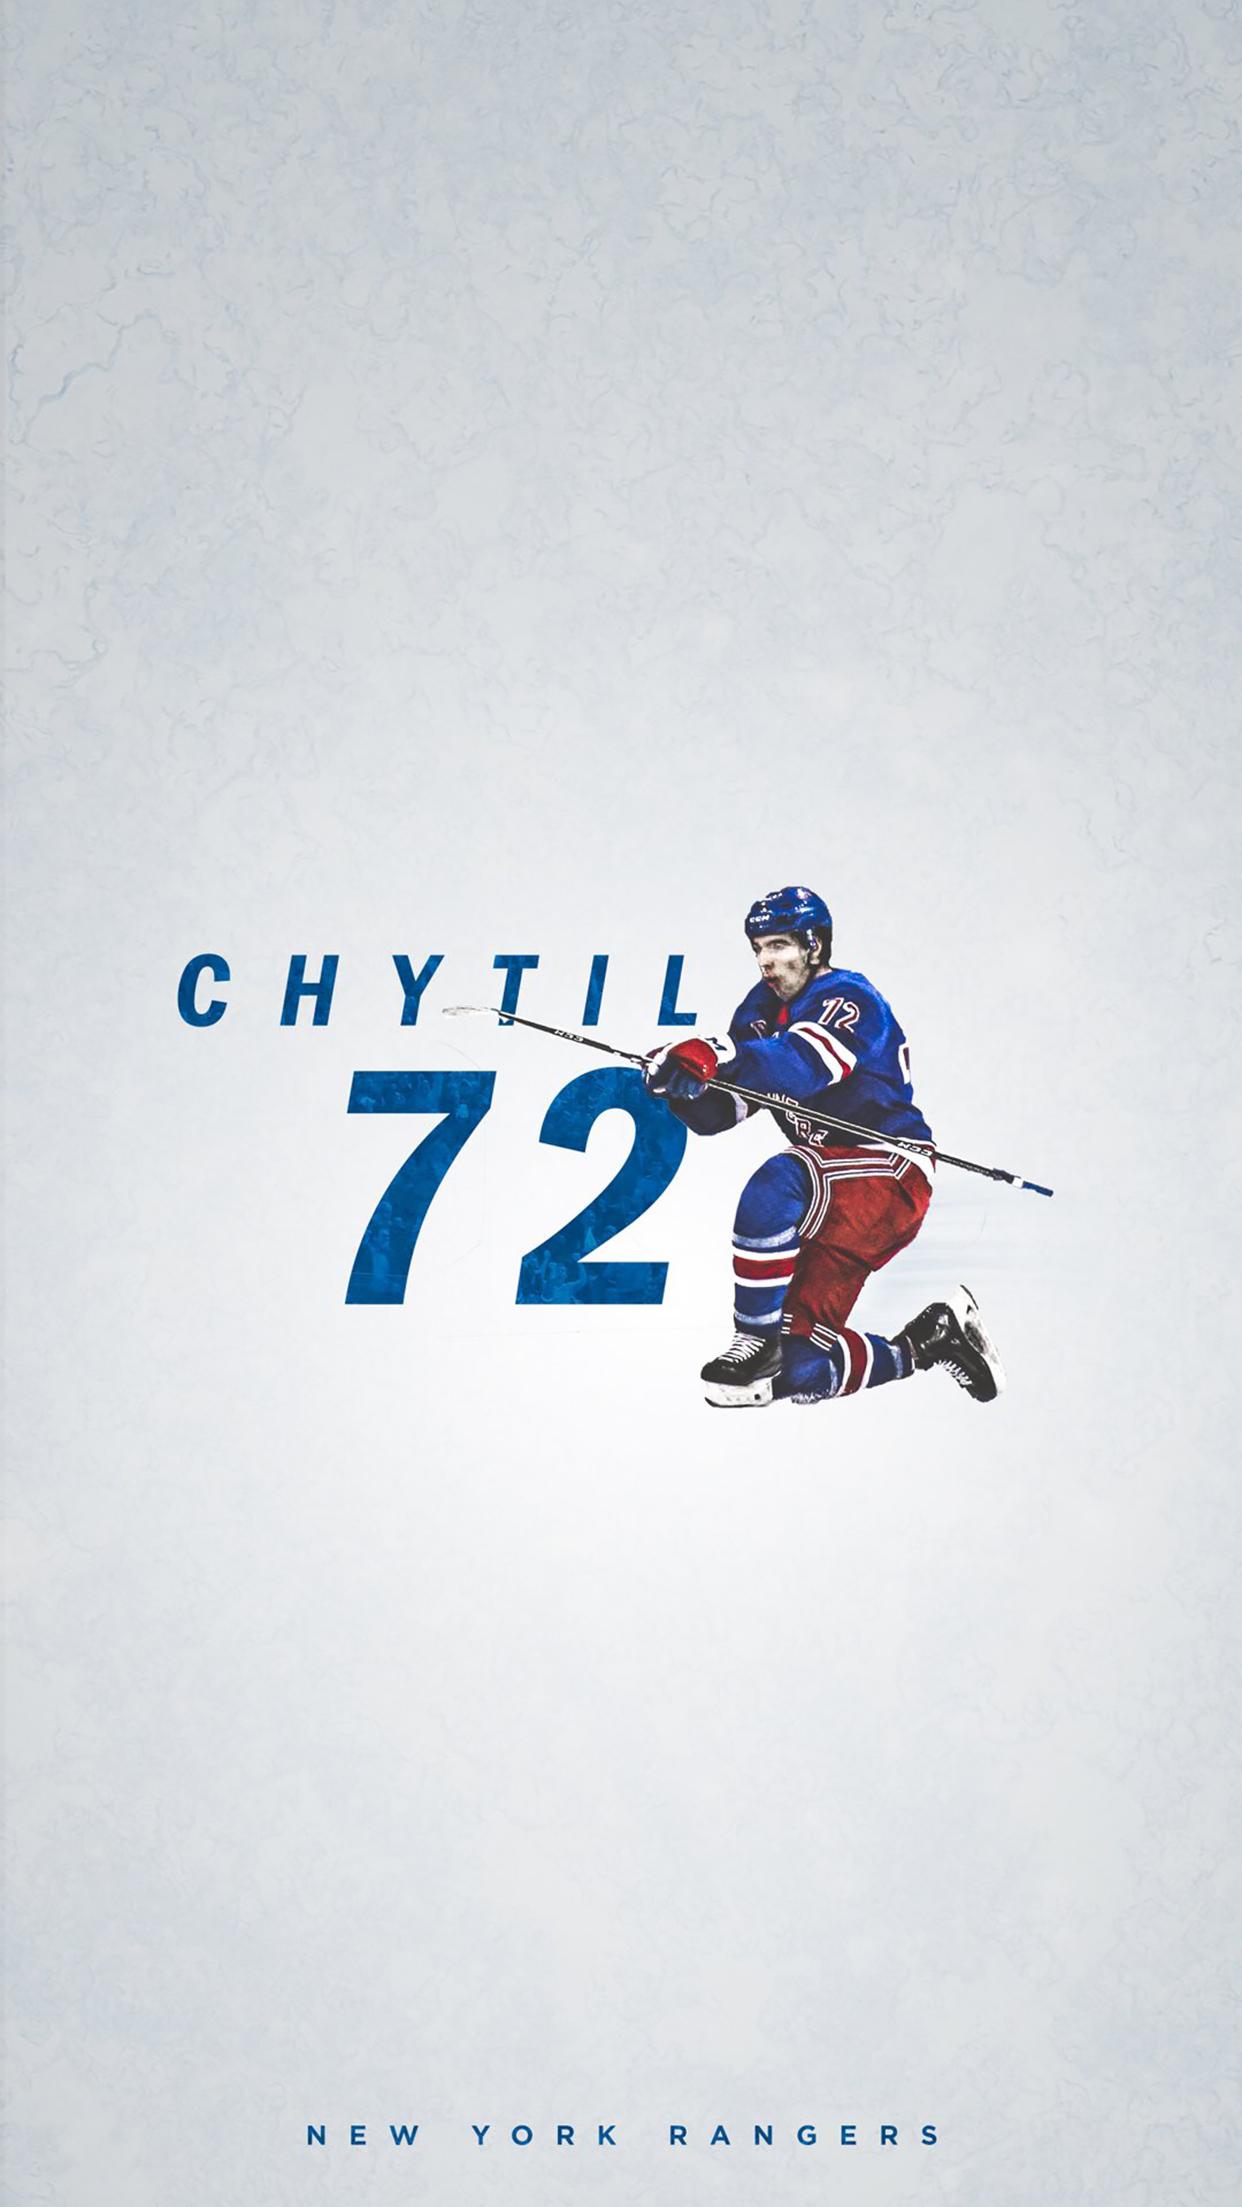 Mobile Wallpaper Downloads New York Rangers